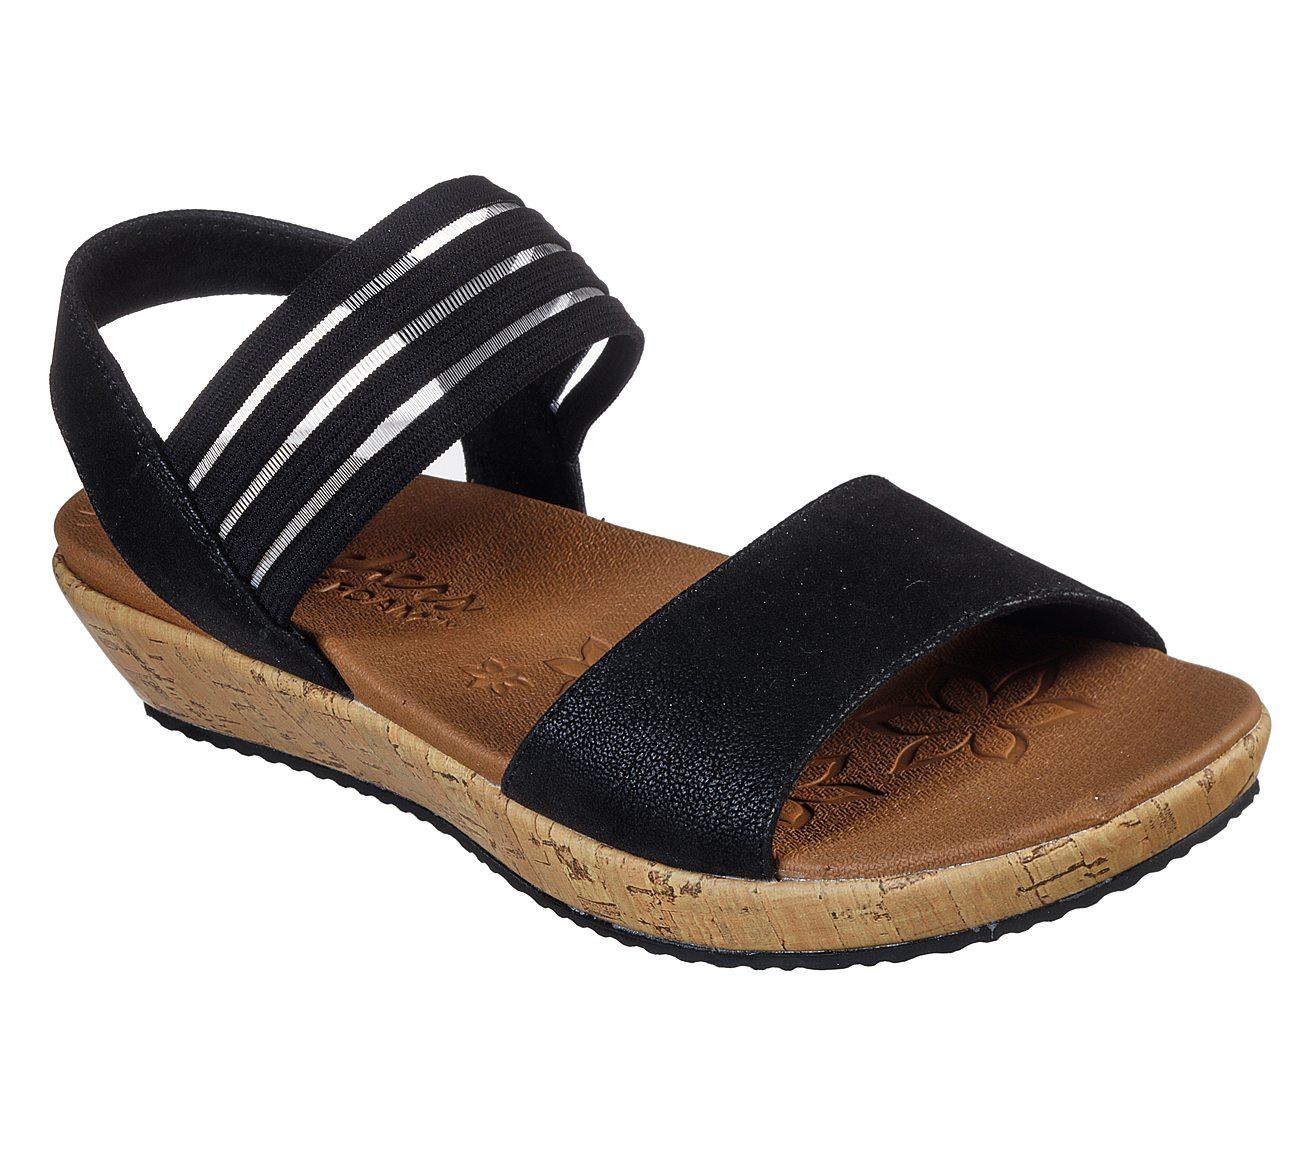 skechers sandals womens uk